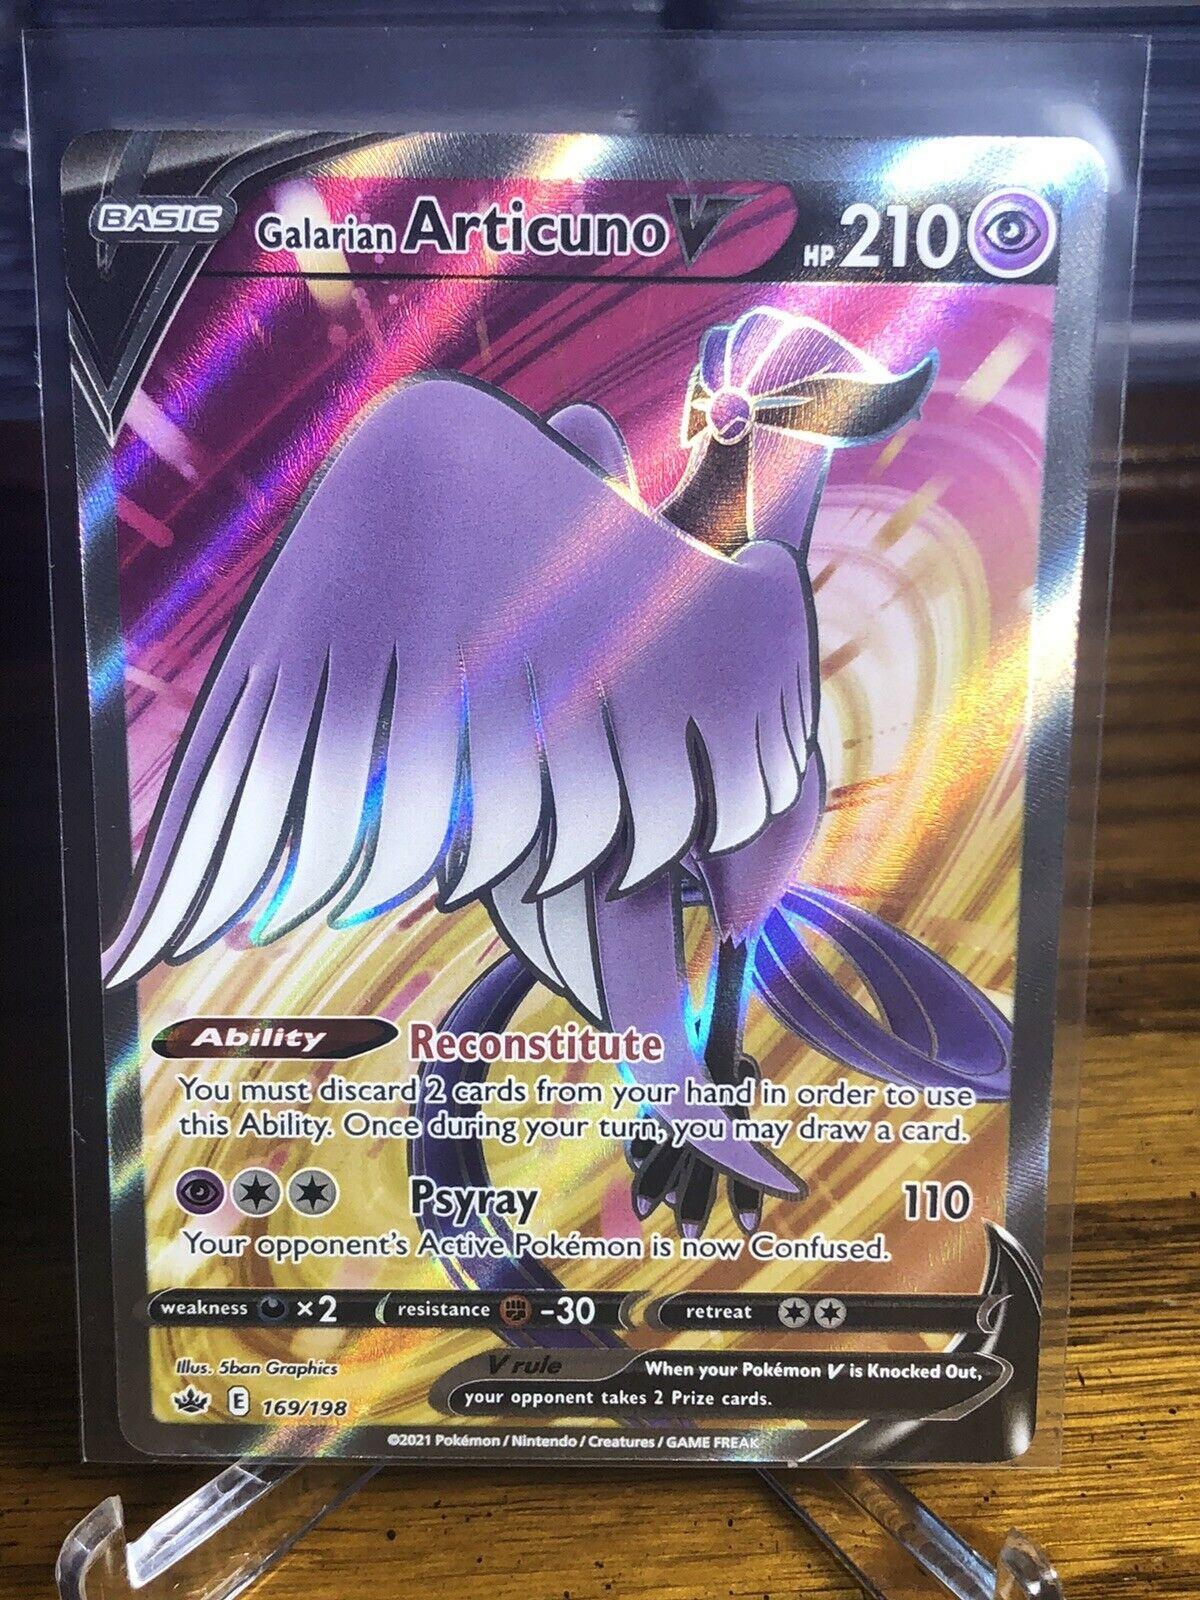 Galarian Articuno V 169/198 Full Art NM/M Chilling Reign Pokemon Card 🔥🔥